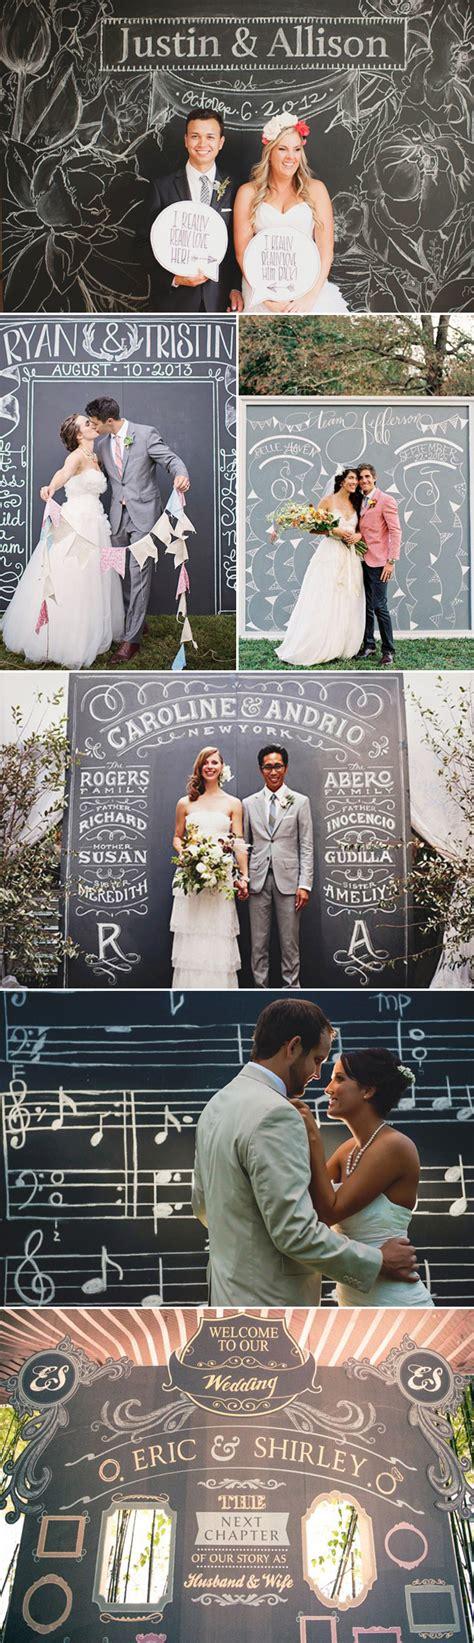 diy chalkboard wedding backdrop 53 creative wedding photo backdrops deer pearl flowers